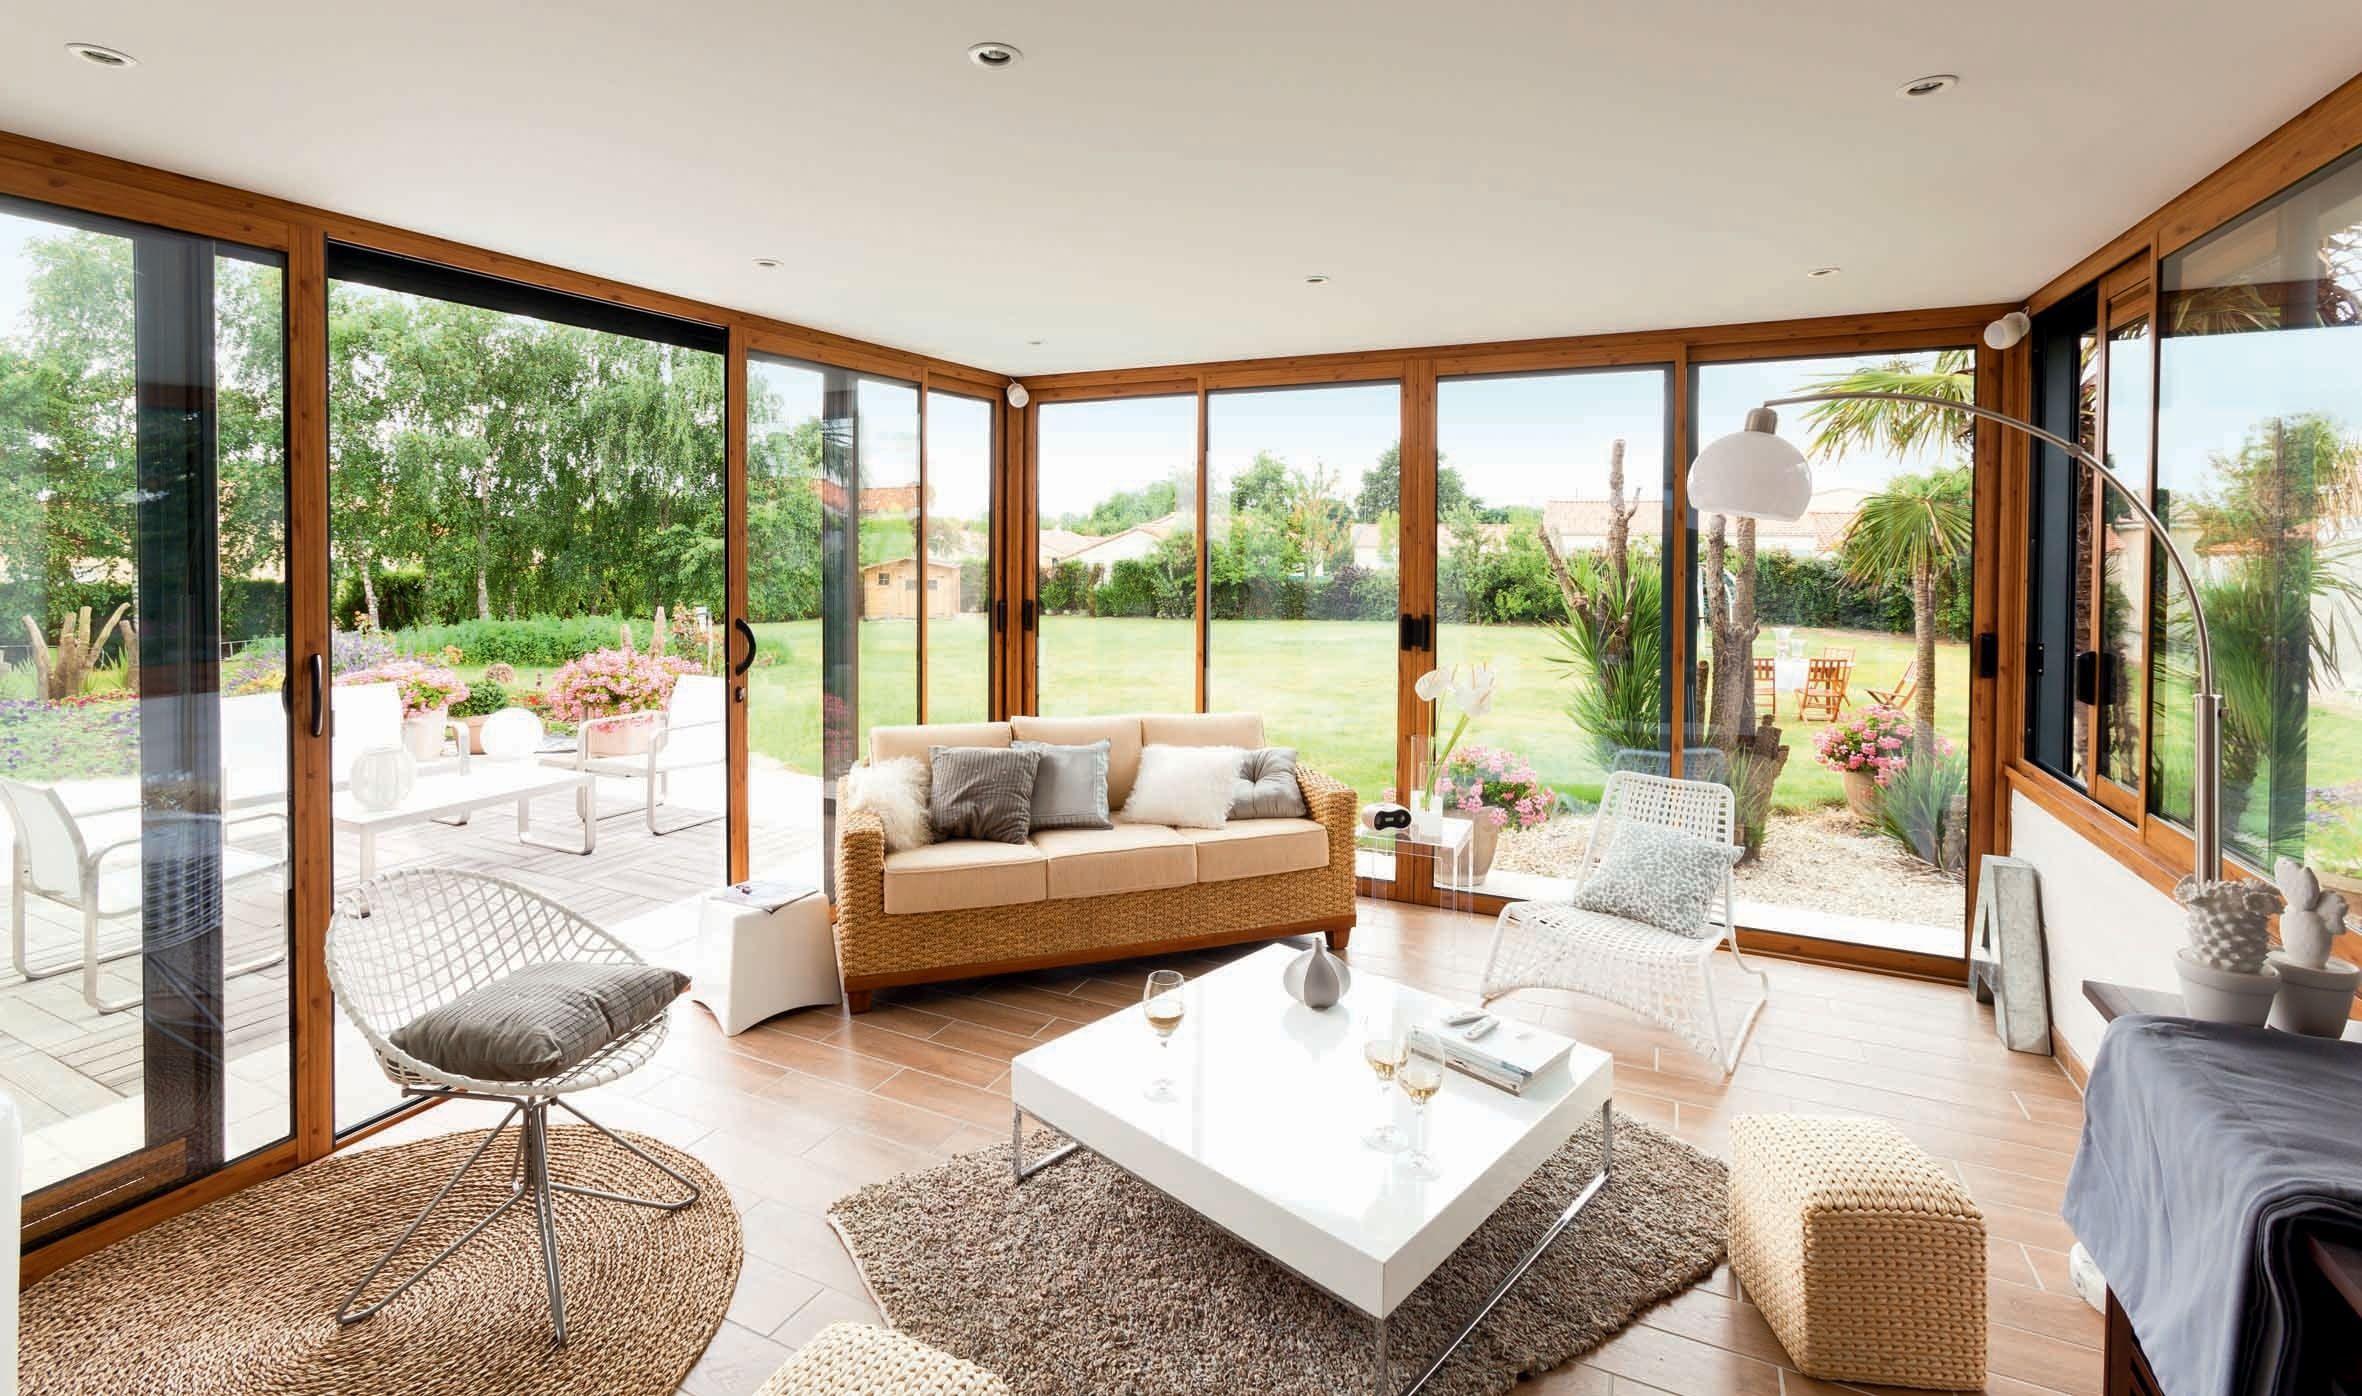 une v randa naturelle et confortable salon pinterest outdoor rooms verandas and home decor. Black Bedroom Furniture Sets. Home Design Ideas